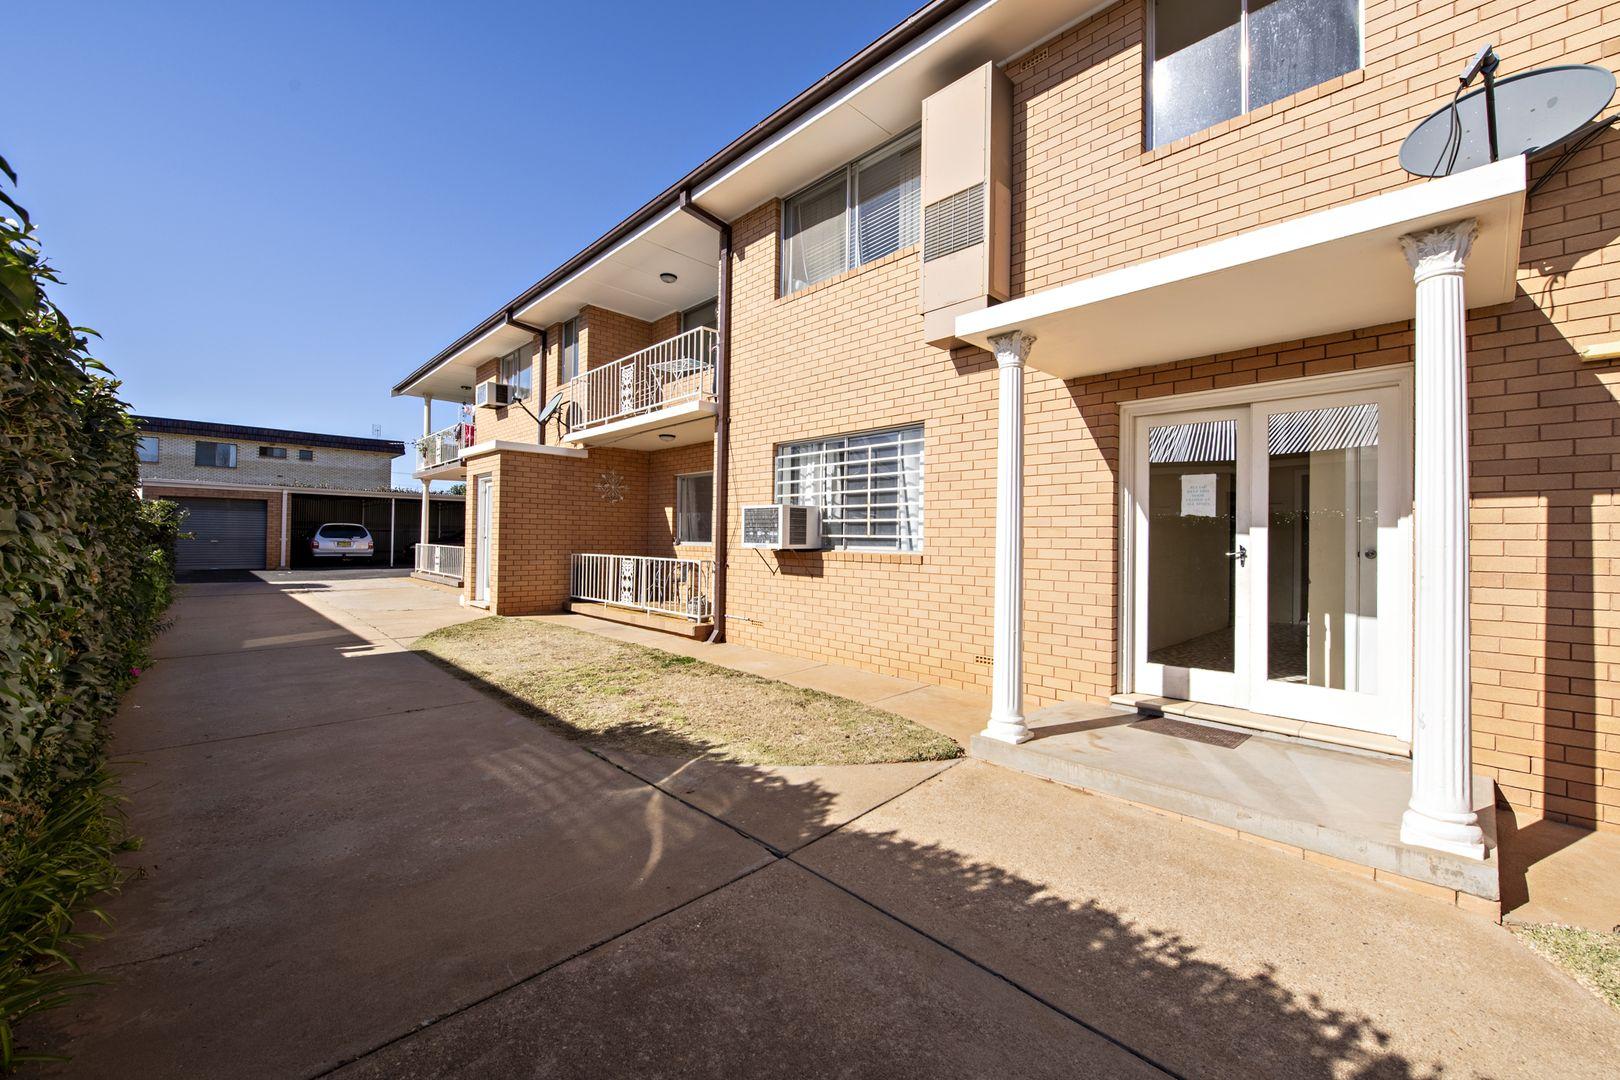 2/10 Smith Street, Dubbo NSW 2830, Image 1